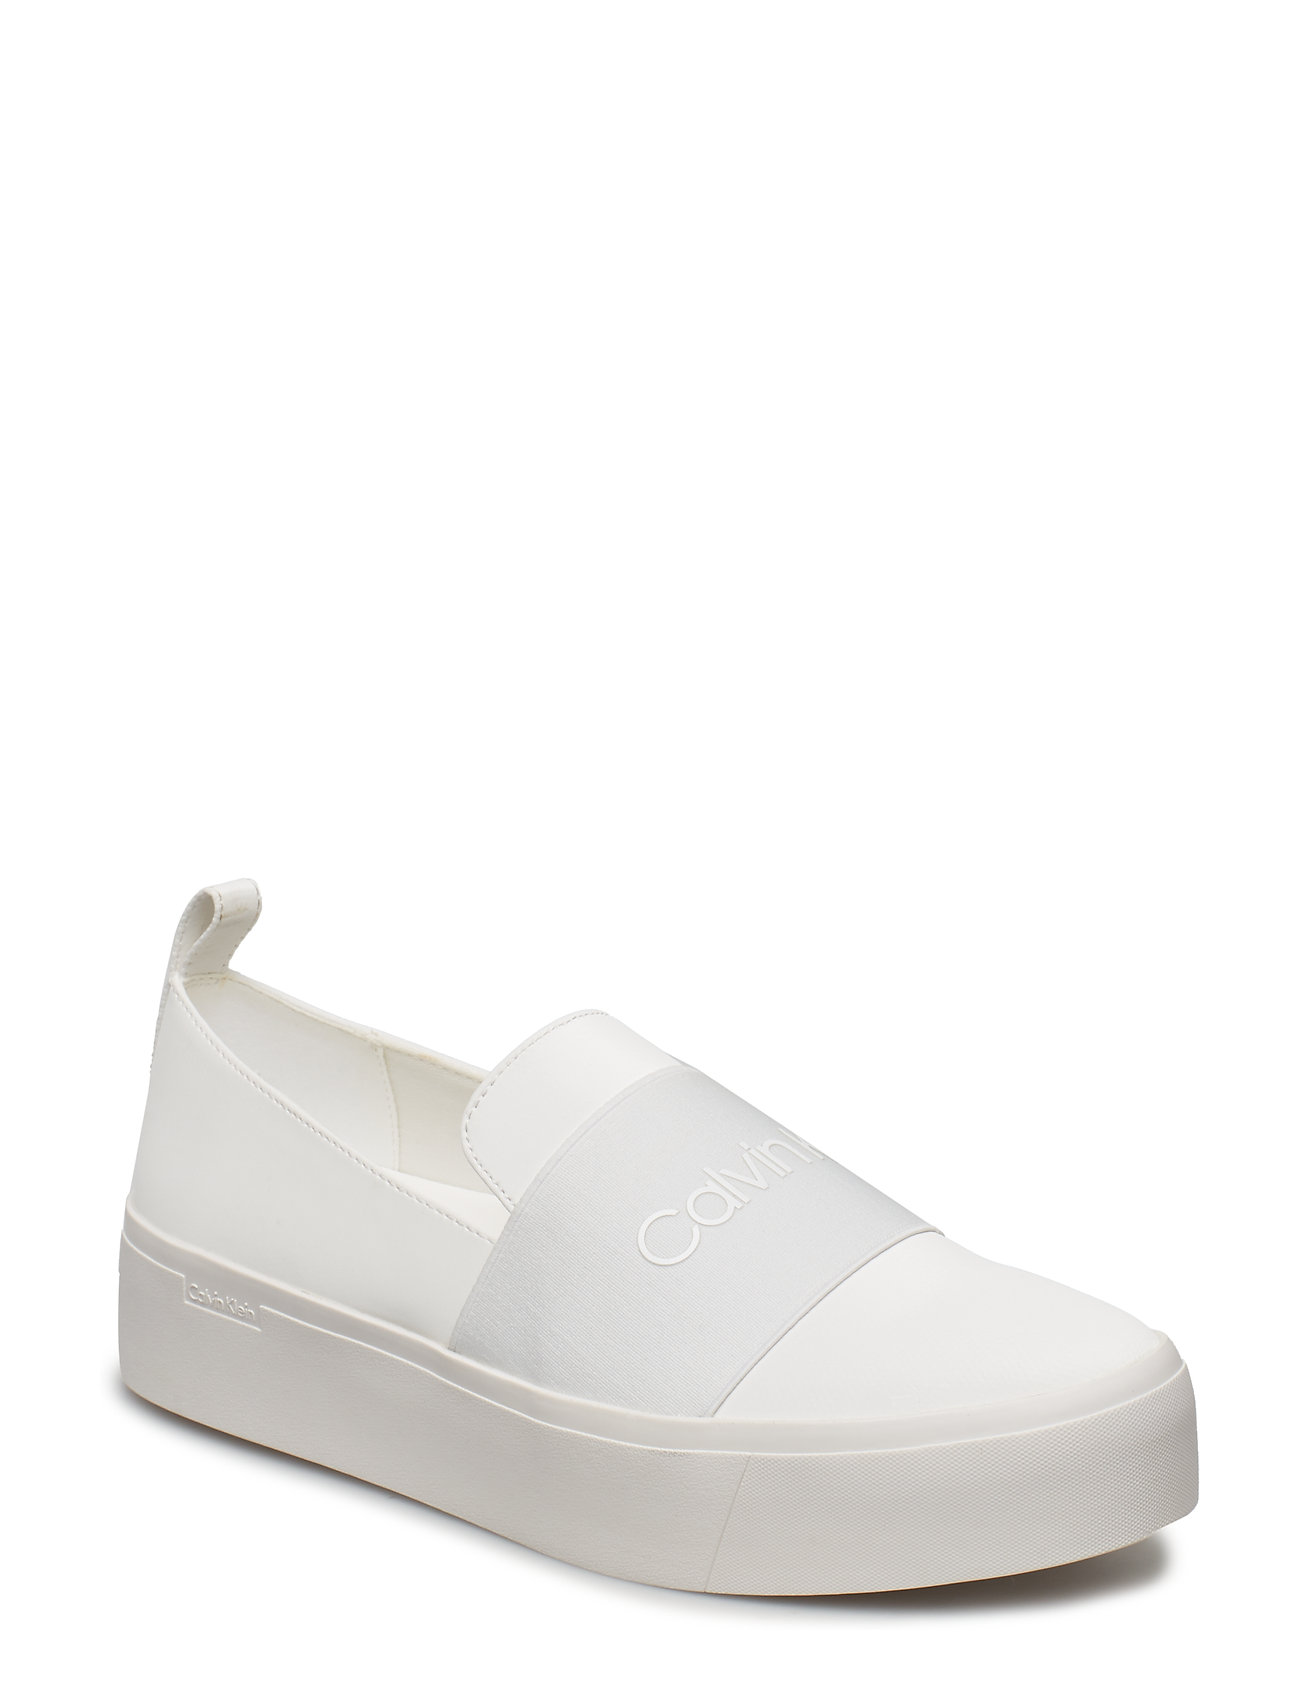 CALVIN KLEIN Jacinta Satin Canvas Sneaker Weiß CALVIN KLEIN